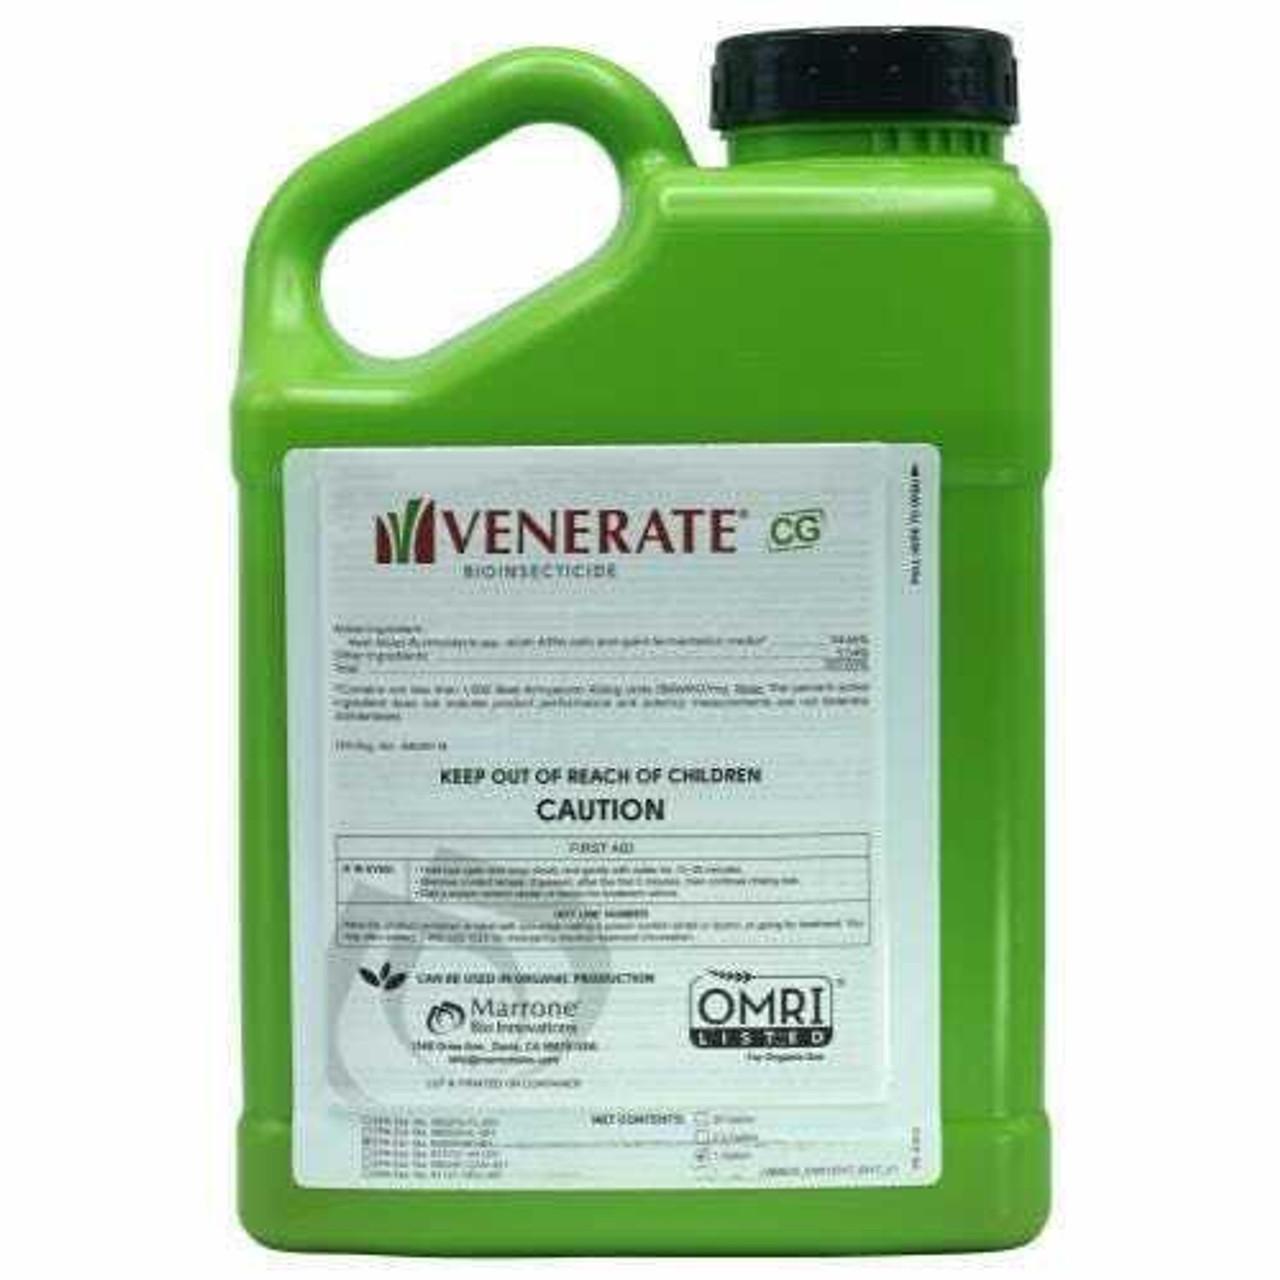 Marrone Bio Innovations Venerate CG Gallon - 1